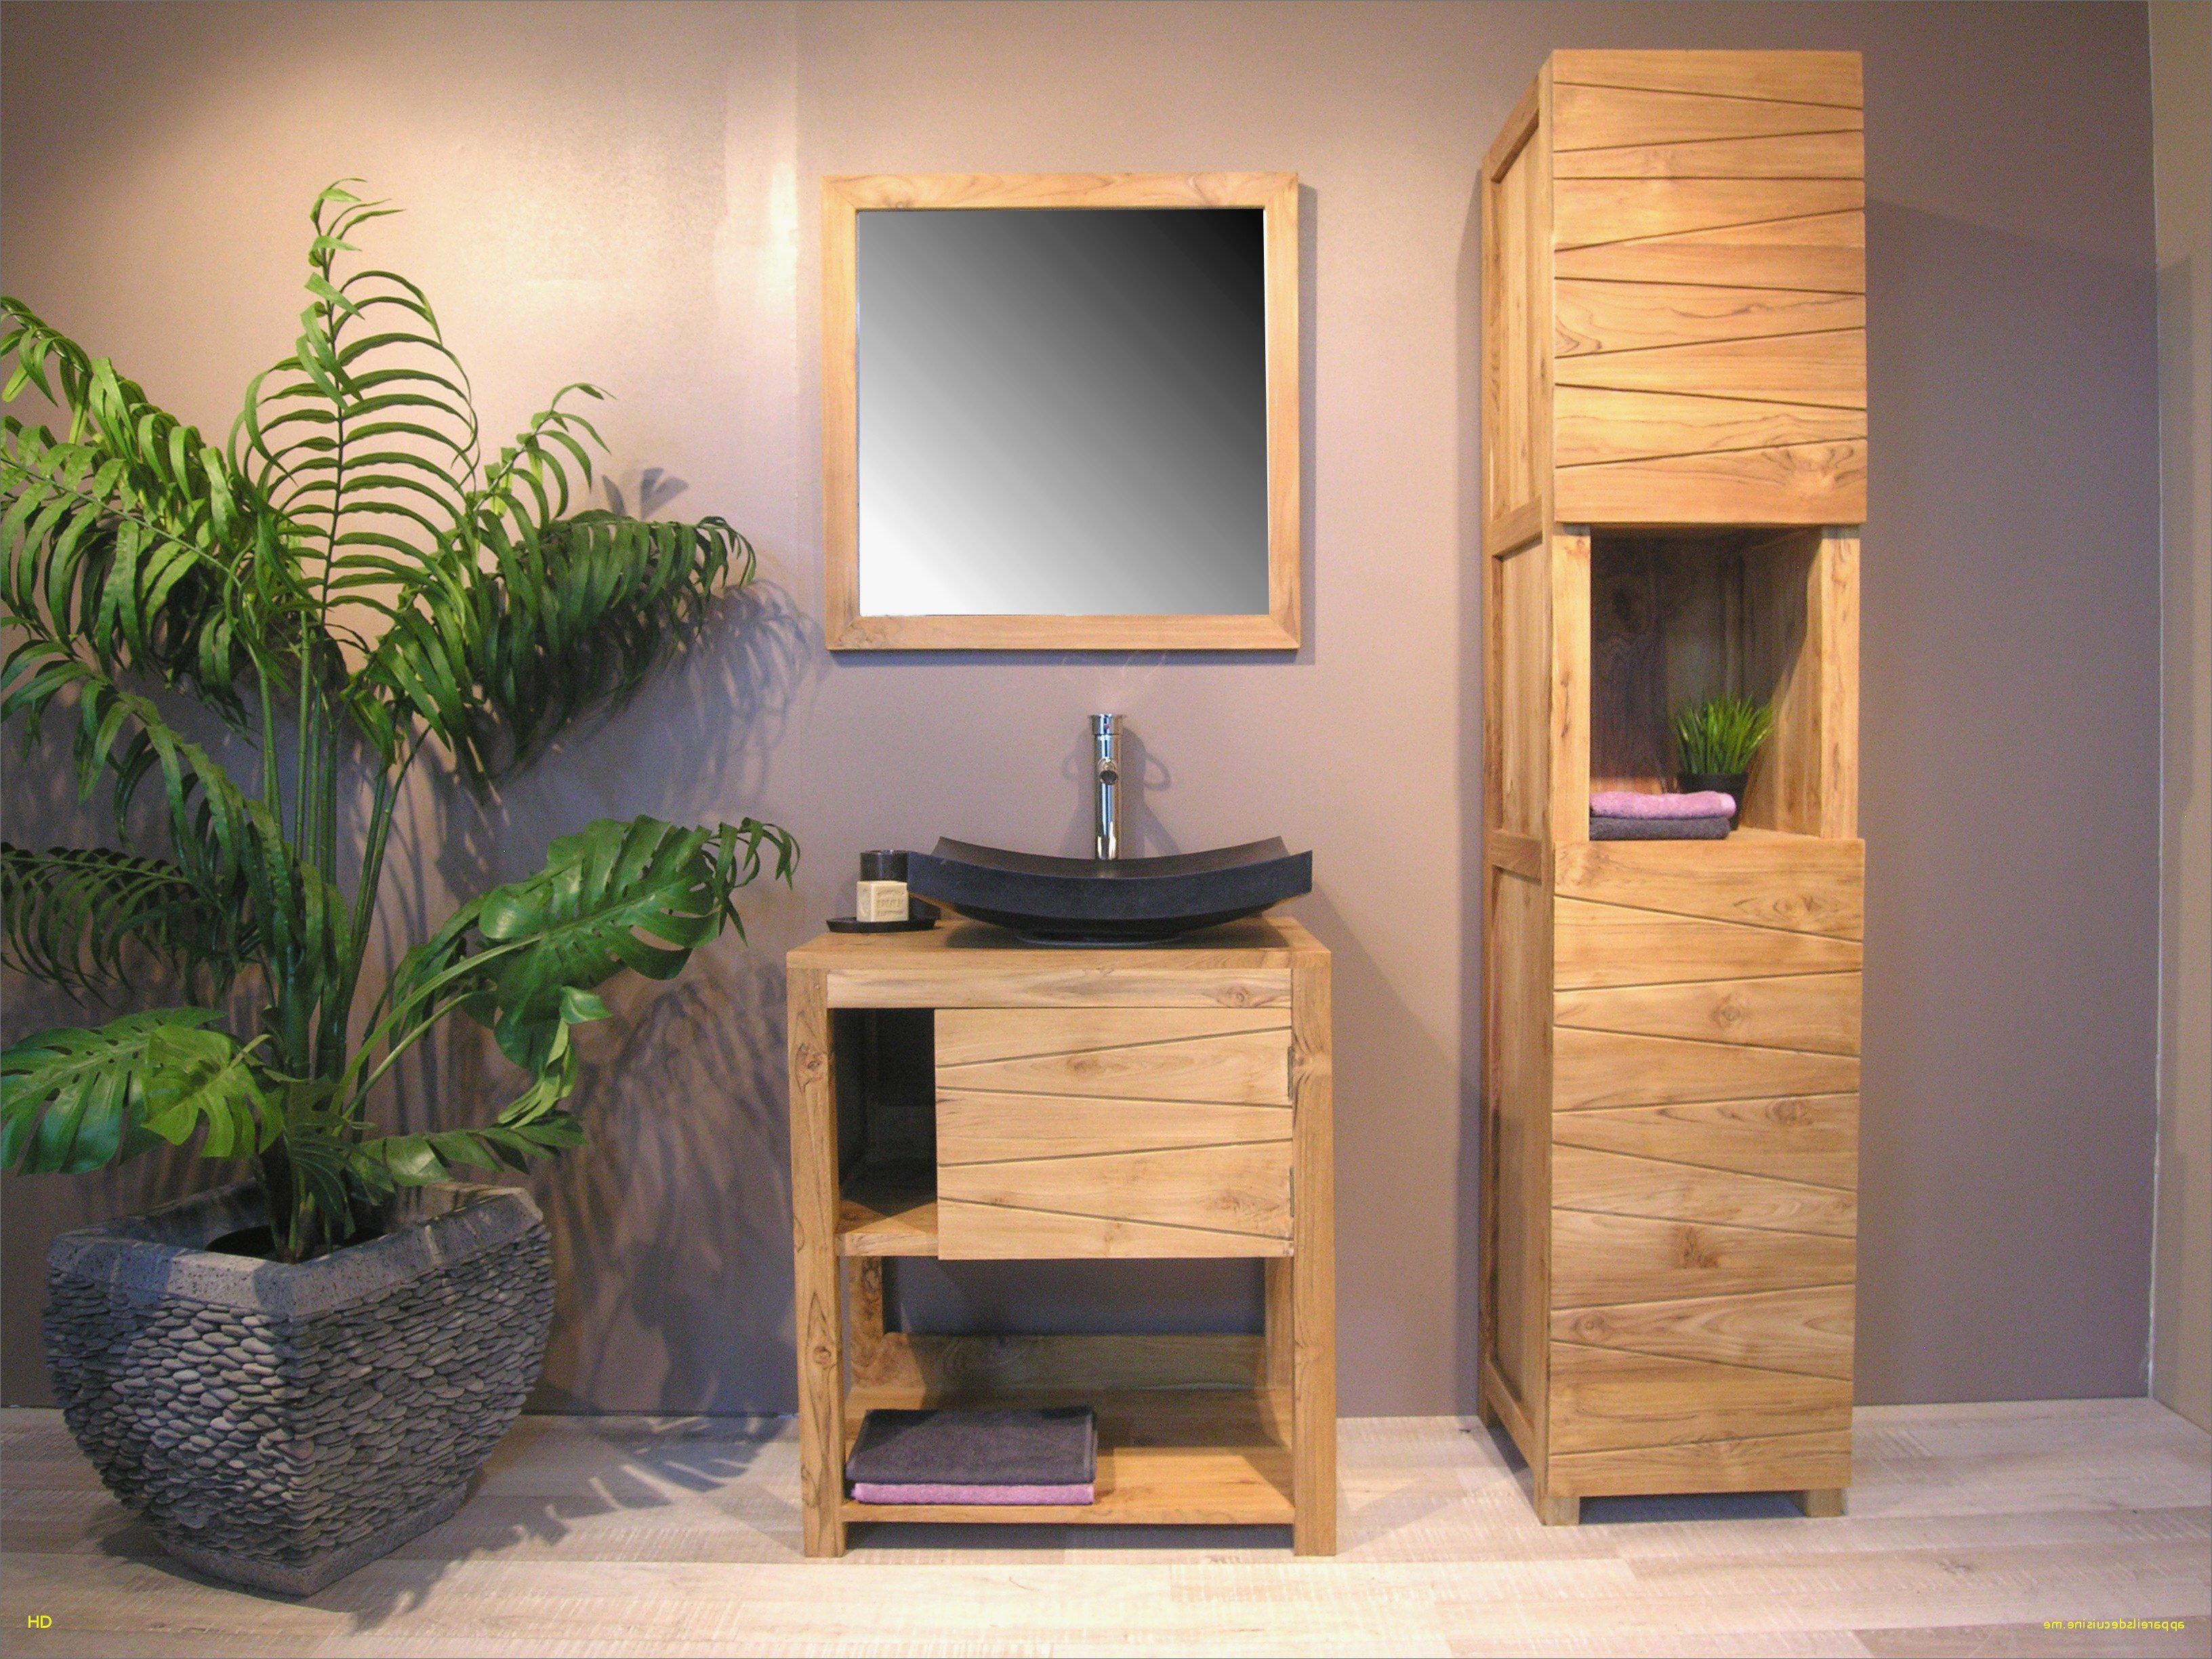 Ikea Miroir Salle De Bains Inspirant Photos √ Ikea Salle De Bain Superbe Plafonnier Salle De Bain Led Best Ikea